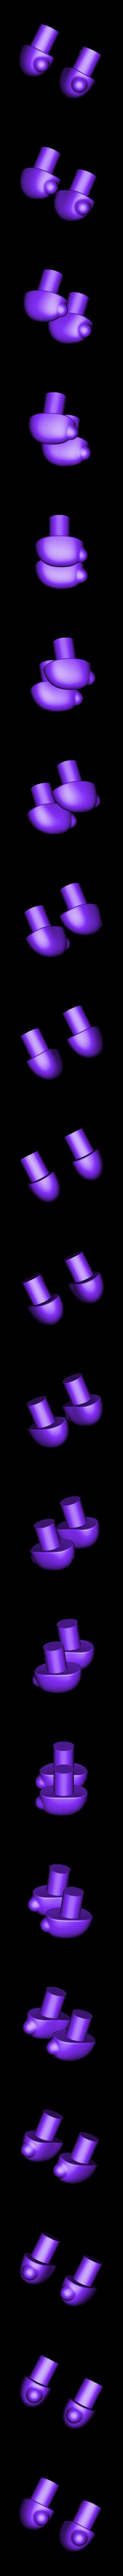 86Duino-Kiki-e.STL Download free STL file Little Twin Stars / リトルツインスターズ / 雙子星 -- Kiki(キキ) • 3D printing design, 86Duino